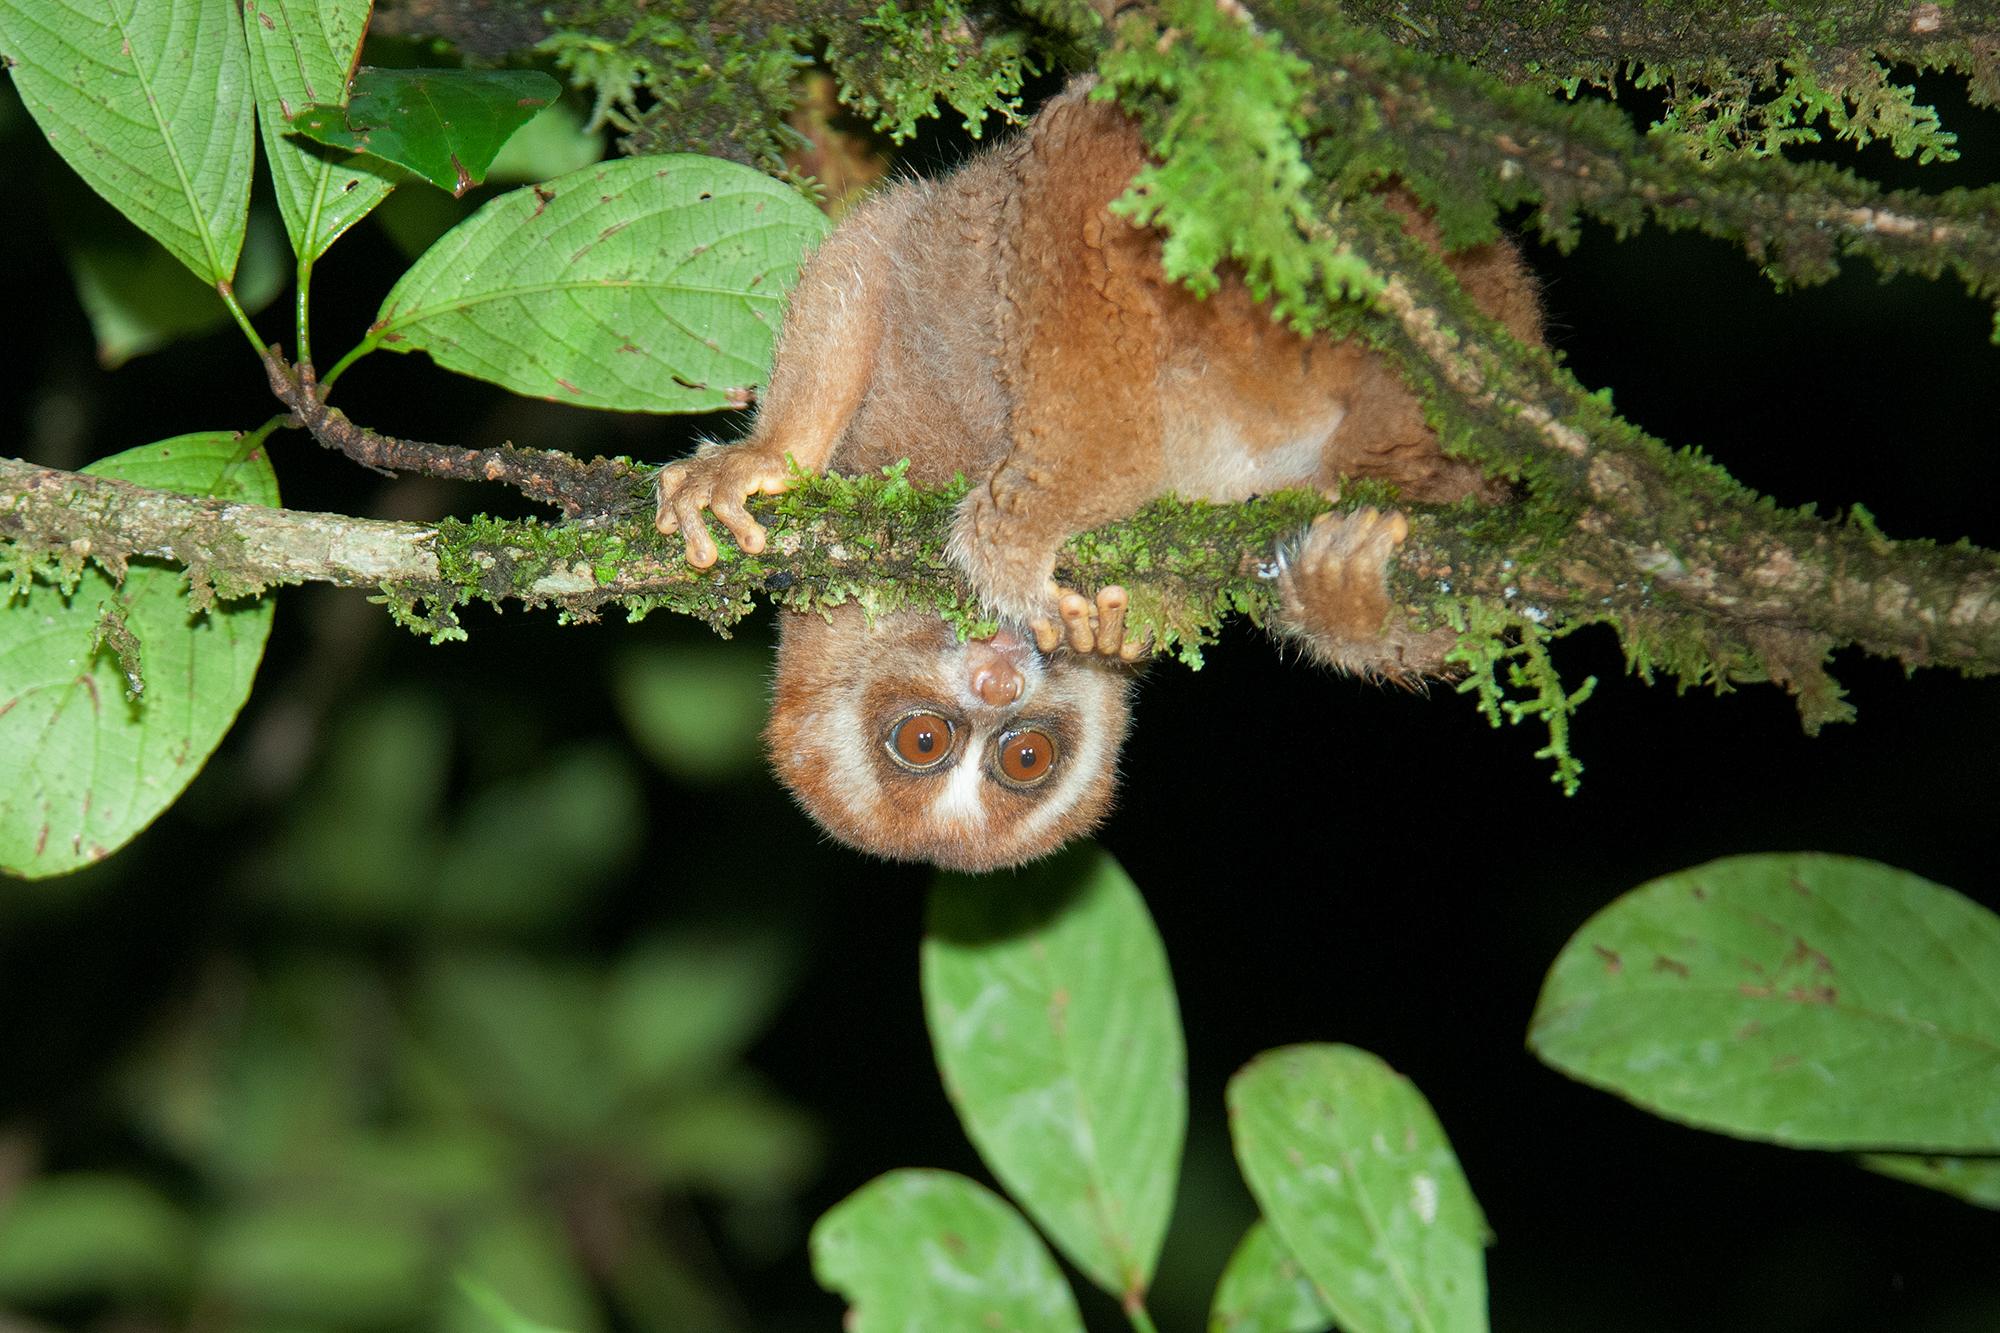 Slow Loris at night on Kinabatangan River in Borneo